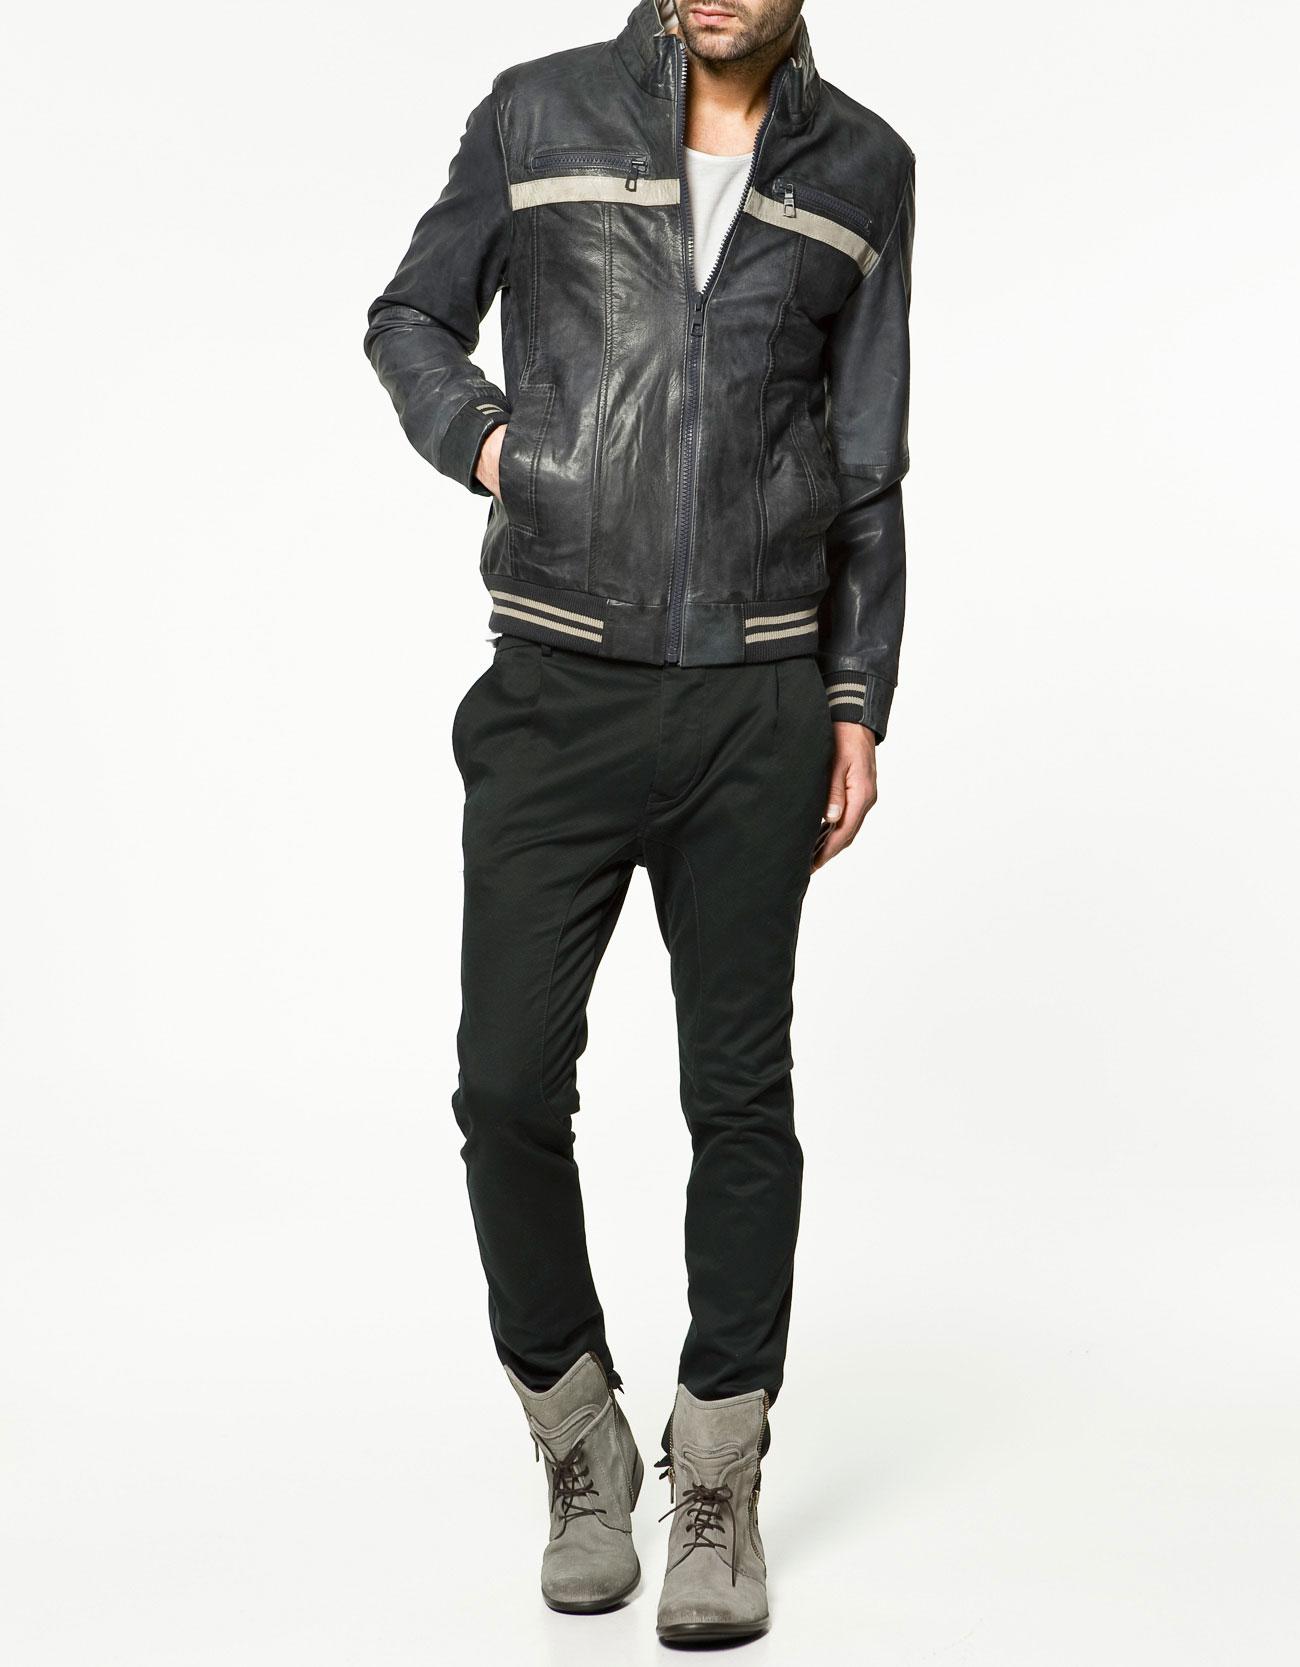 Zara mens leather jacket